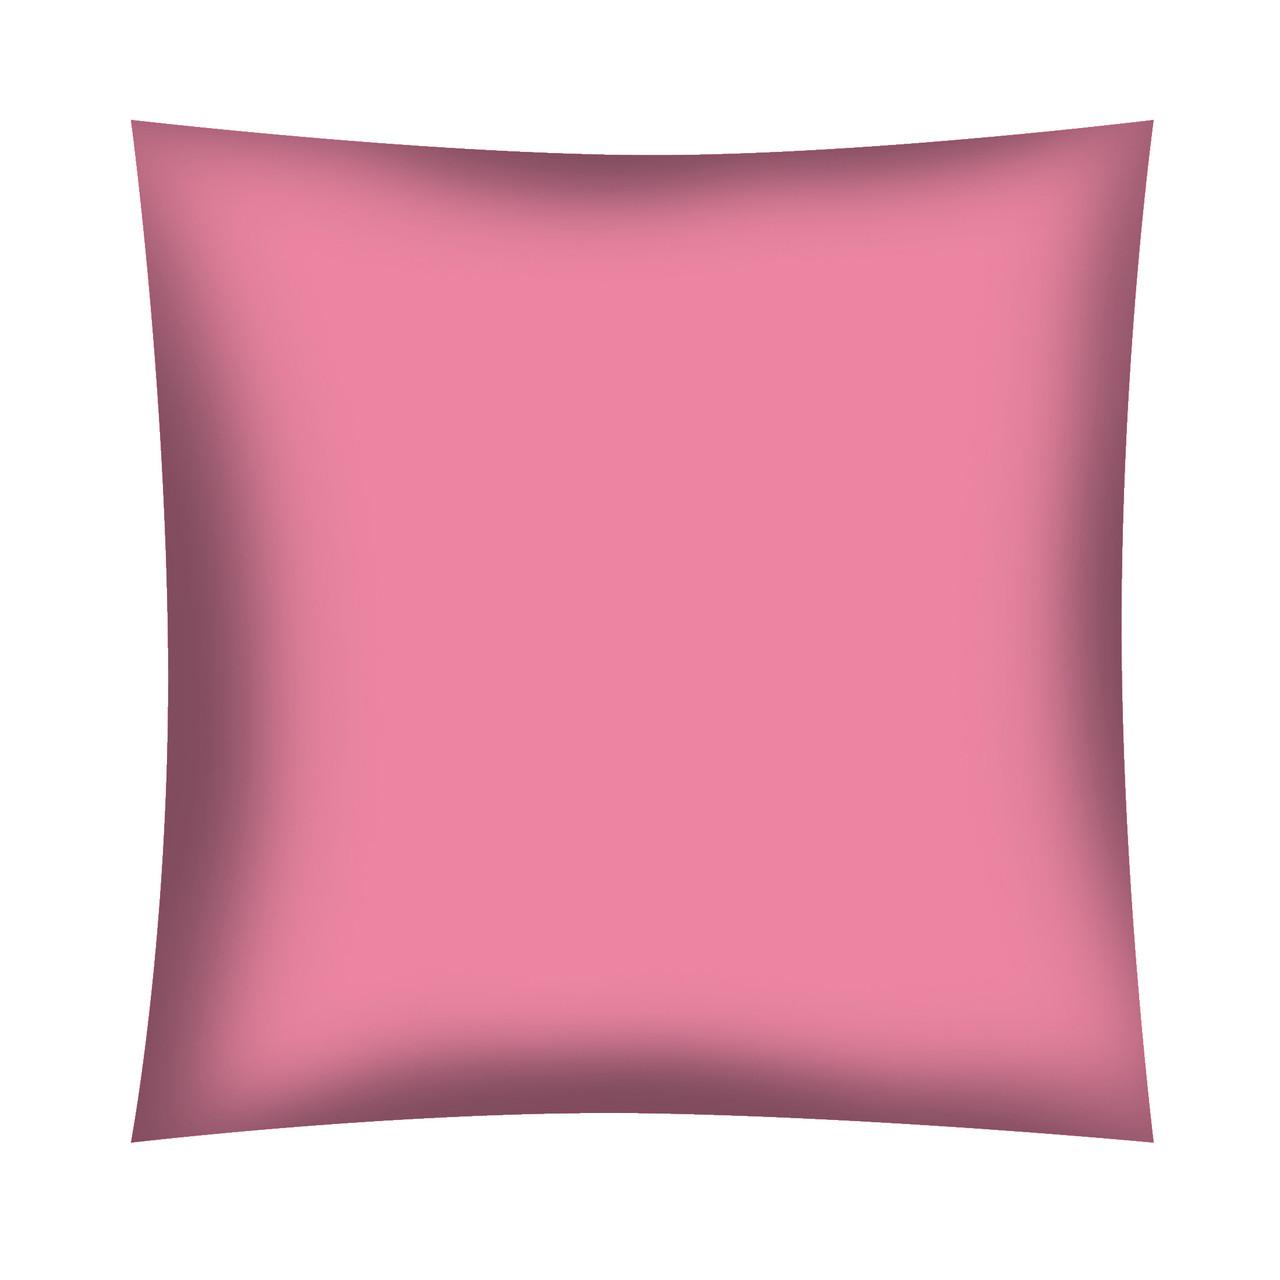 ✁ Отрезы Однотонной темно-розовой бязи